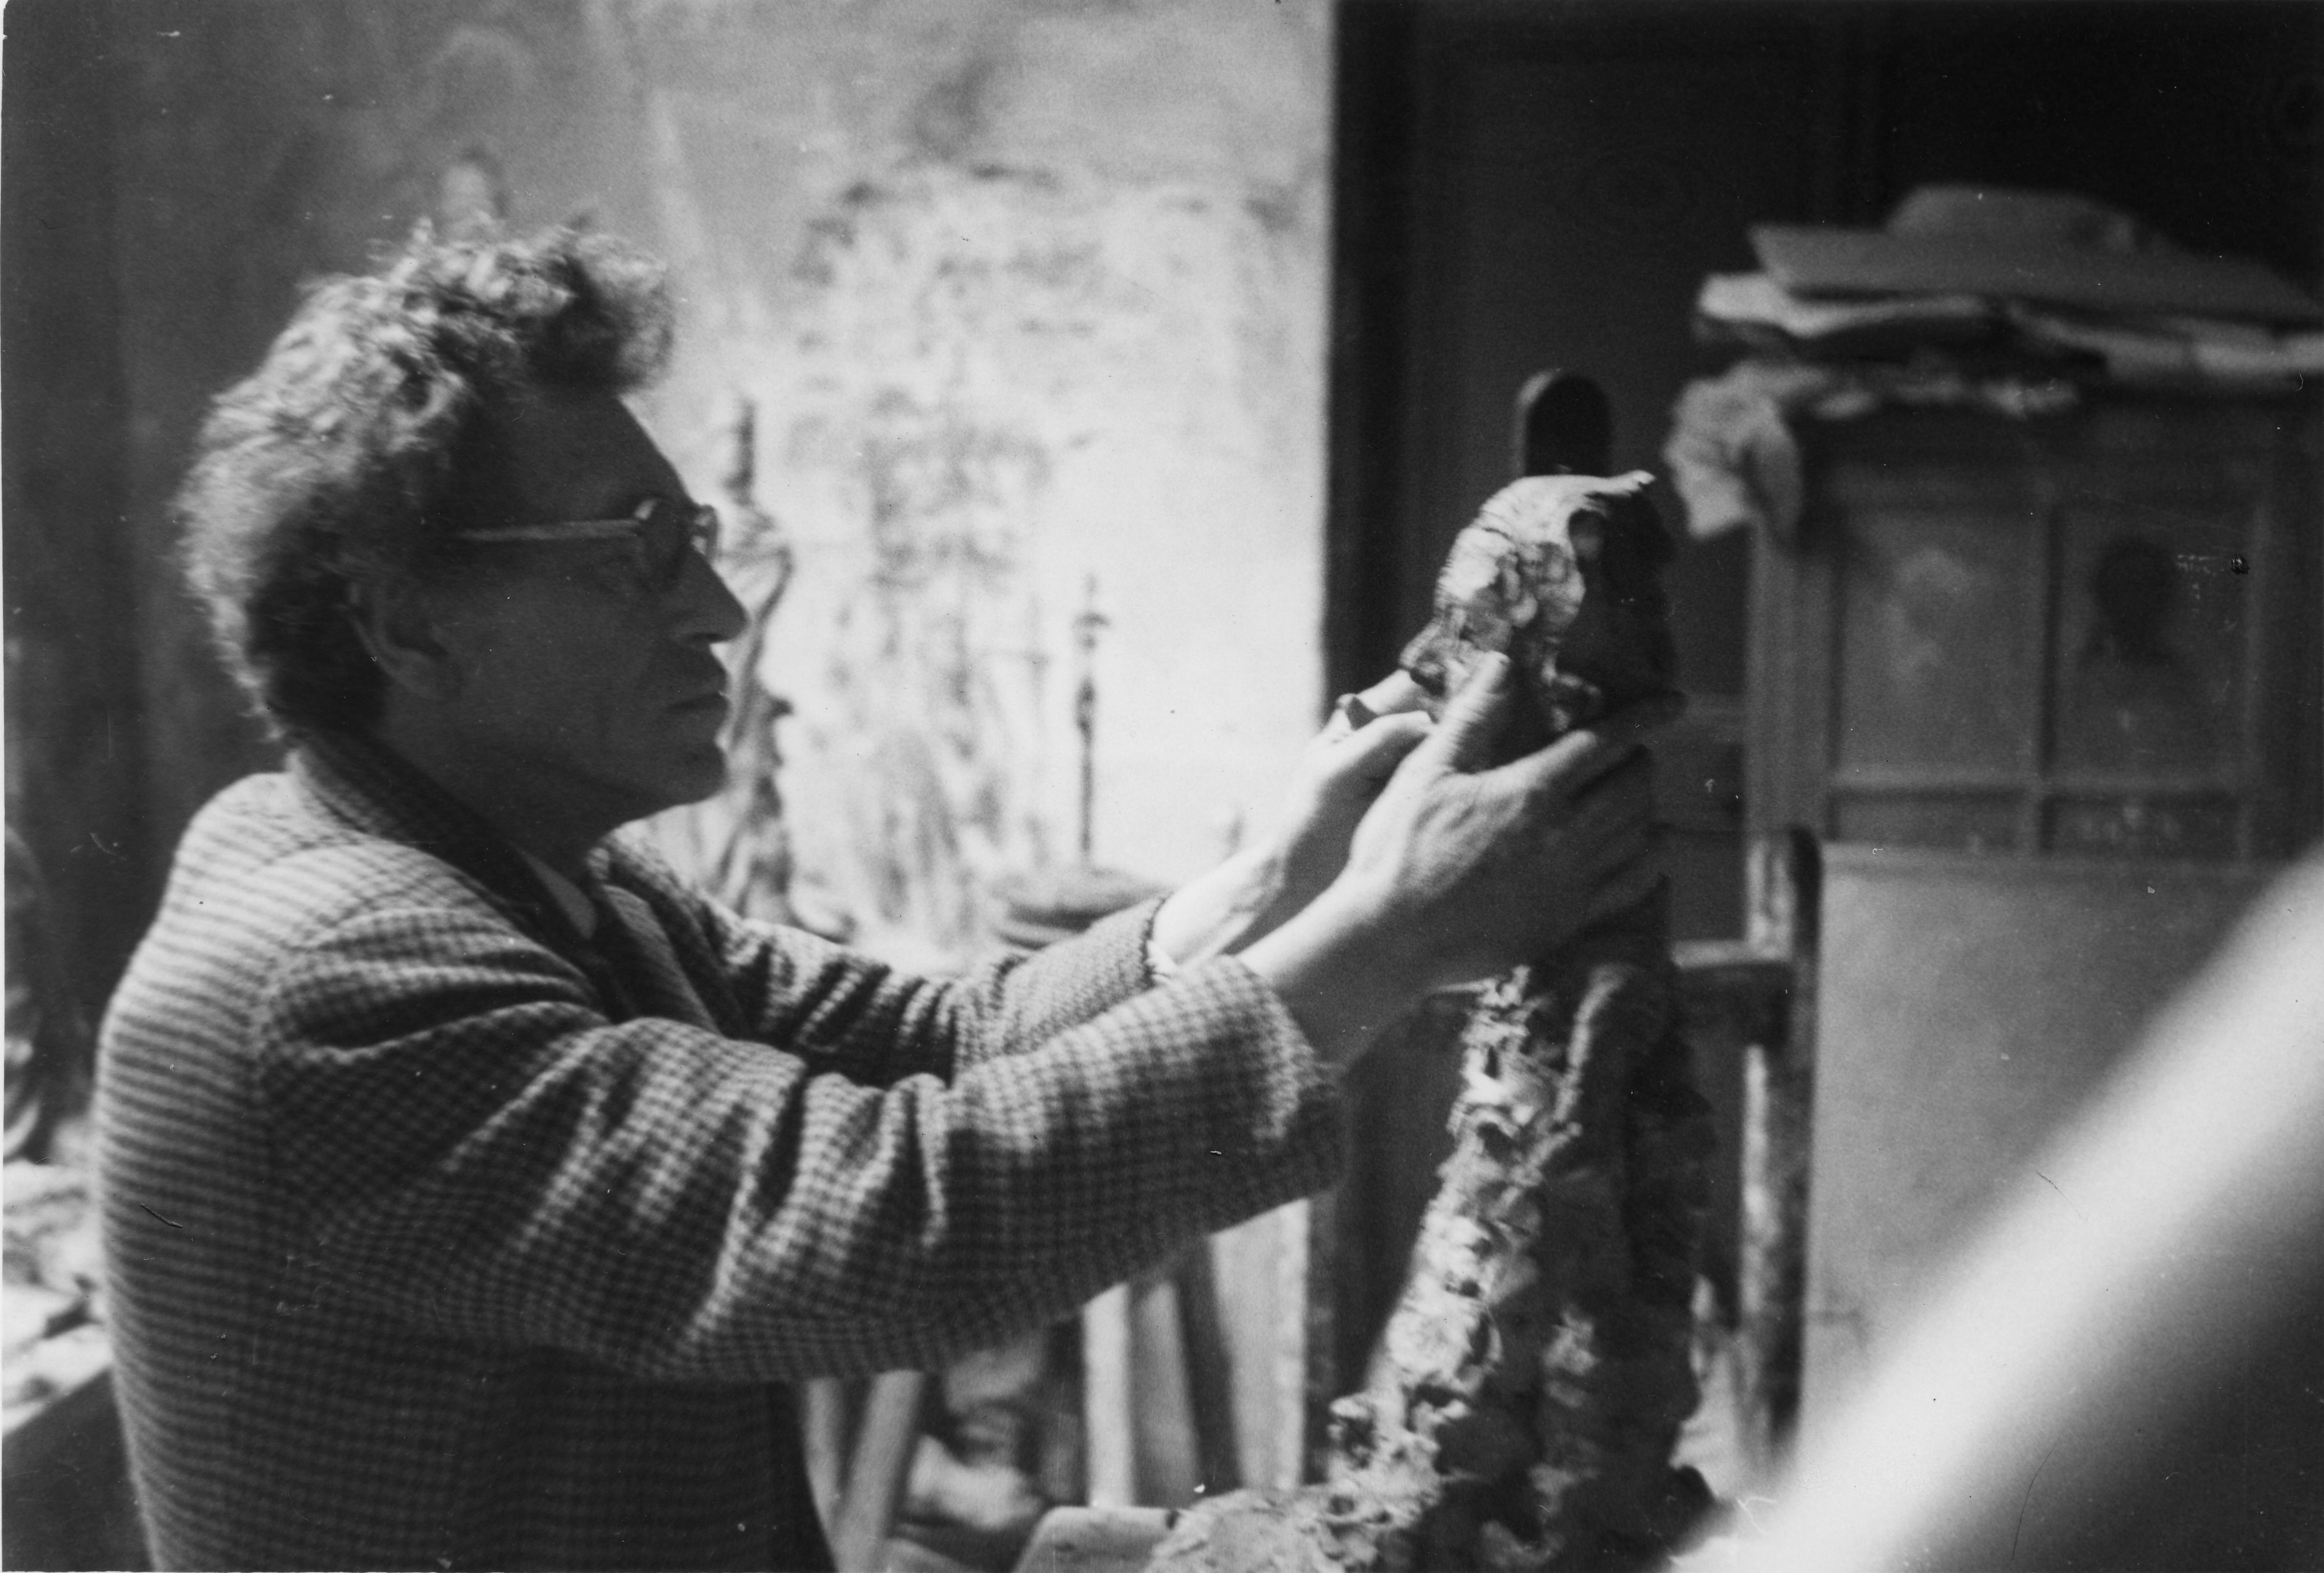 Tête sculptée de la mère d'Alberto Giacometti